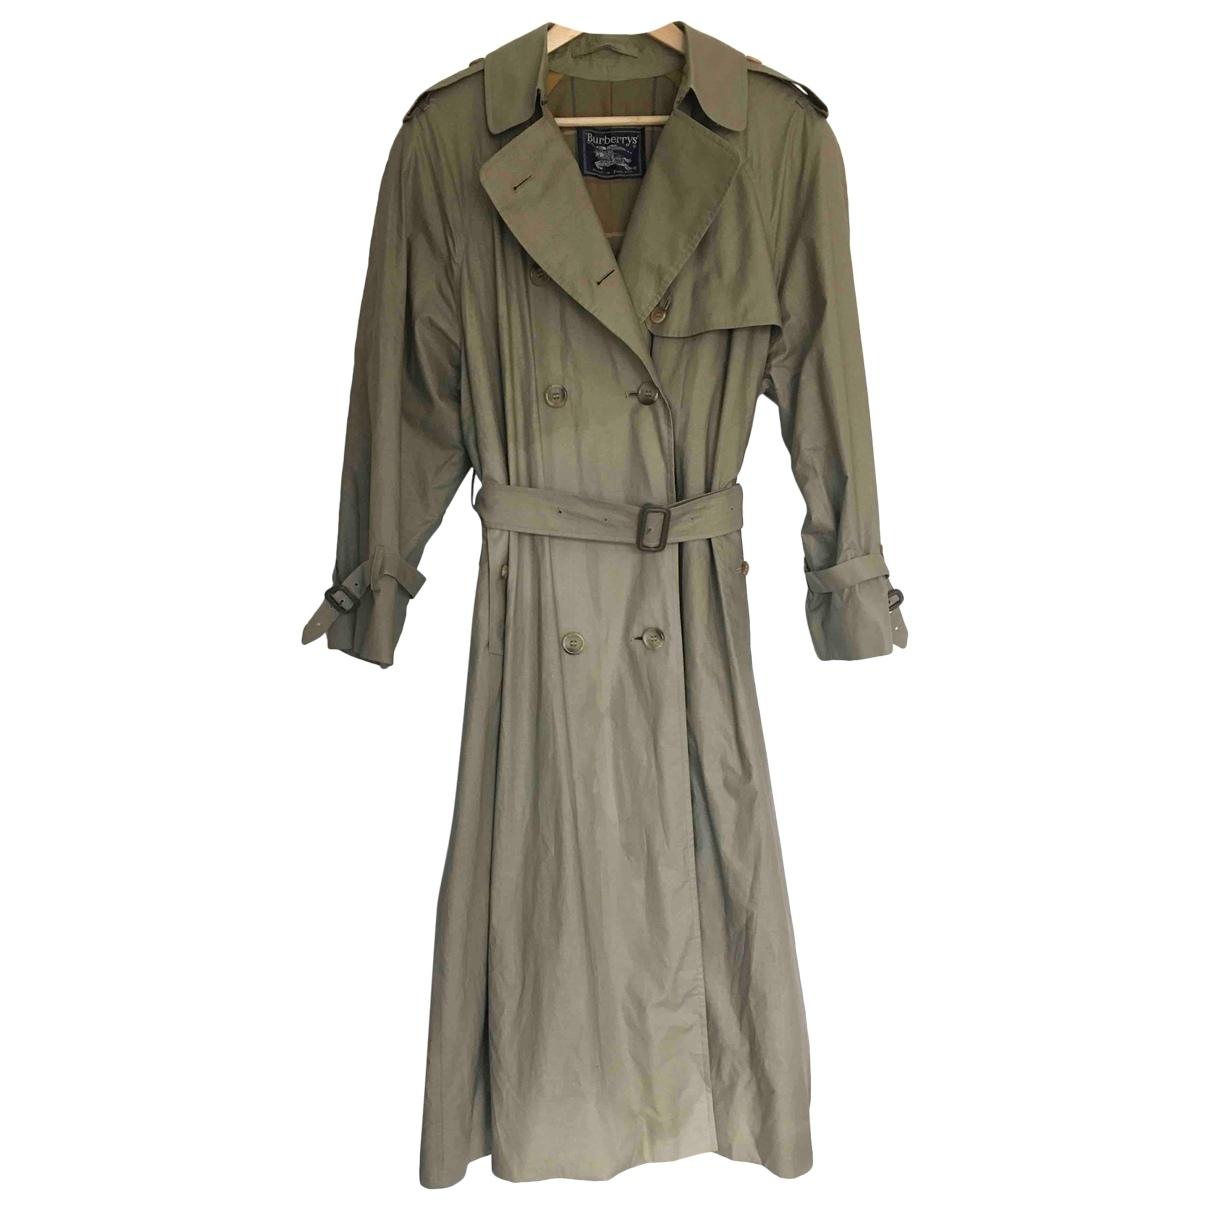 Burberry \N Beige Cotton Trench coat for Women 12 UK